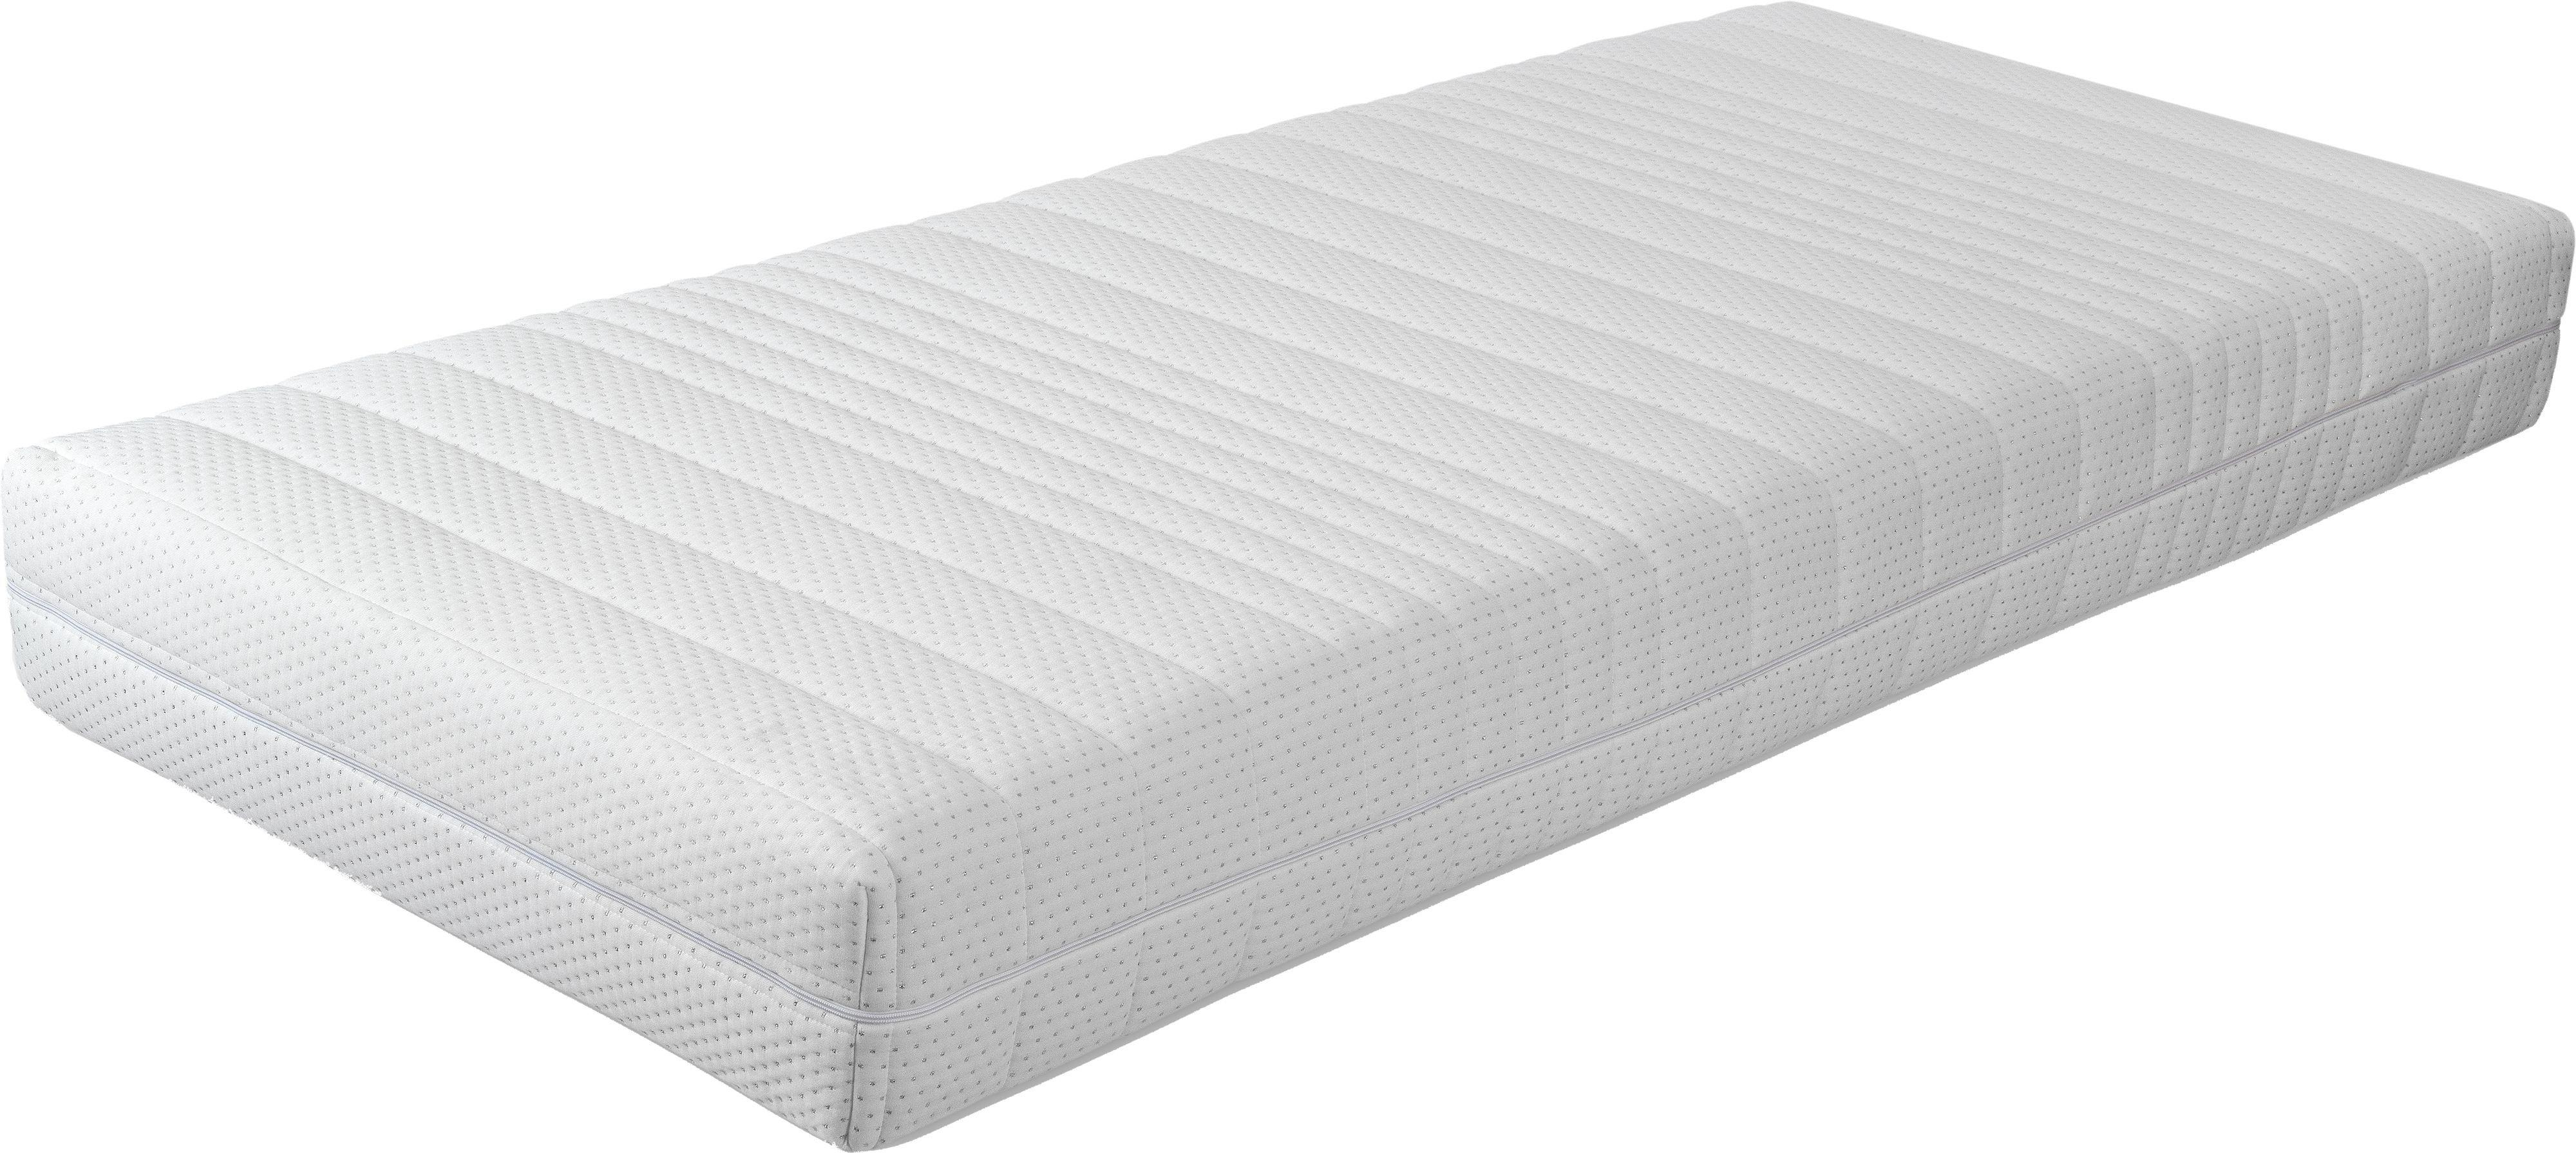 Matrace Viva Alfa H2/h3 80x200cm - bílá, Konvenční, textil (200/80/20cm)